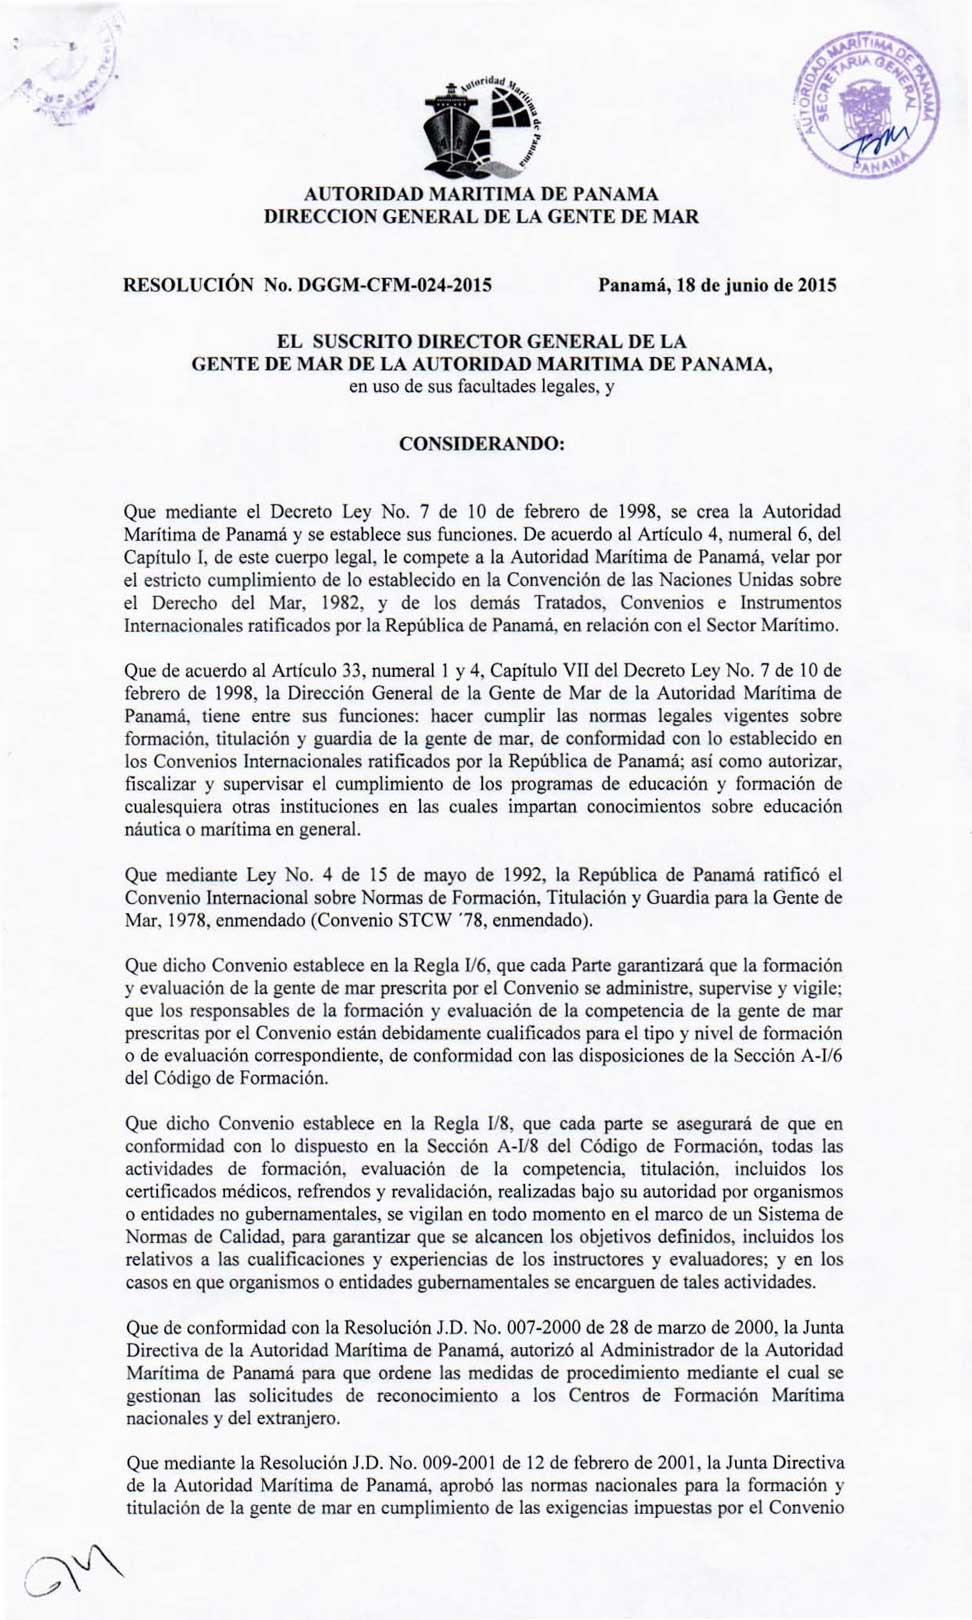 resolucion-pmts-amp-2015-2018-1